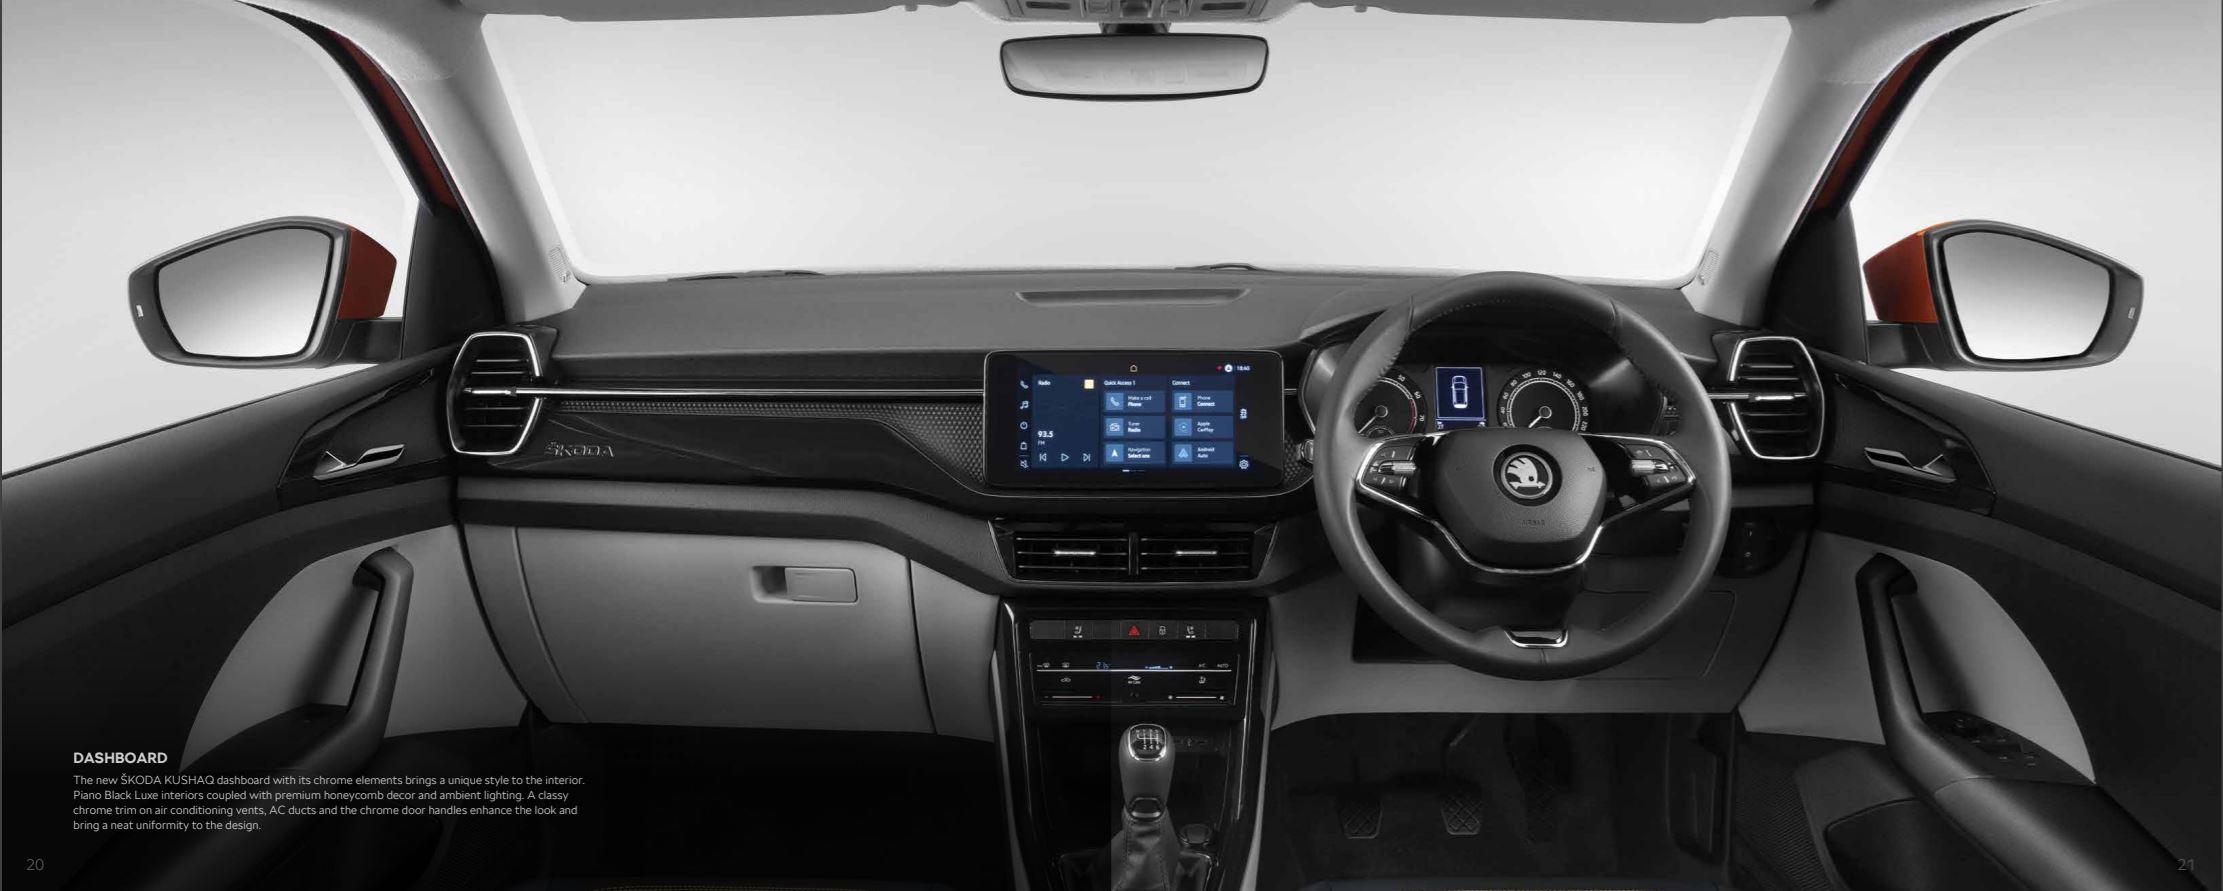 2021 Skoda Kushaq Brochure -  Interior Dashboard